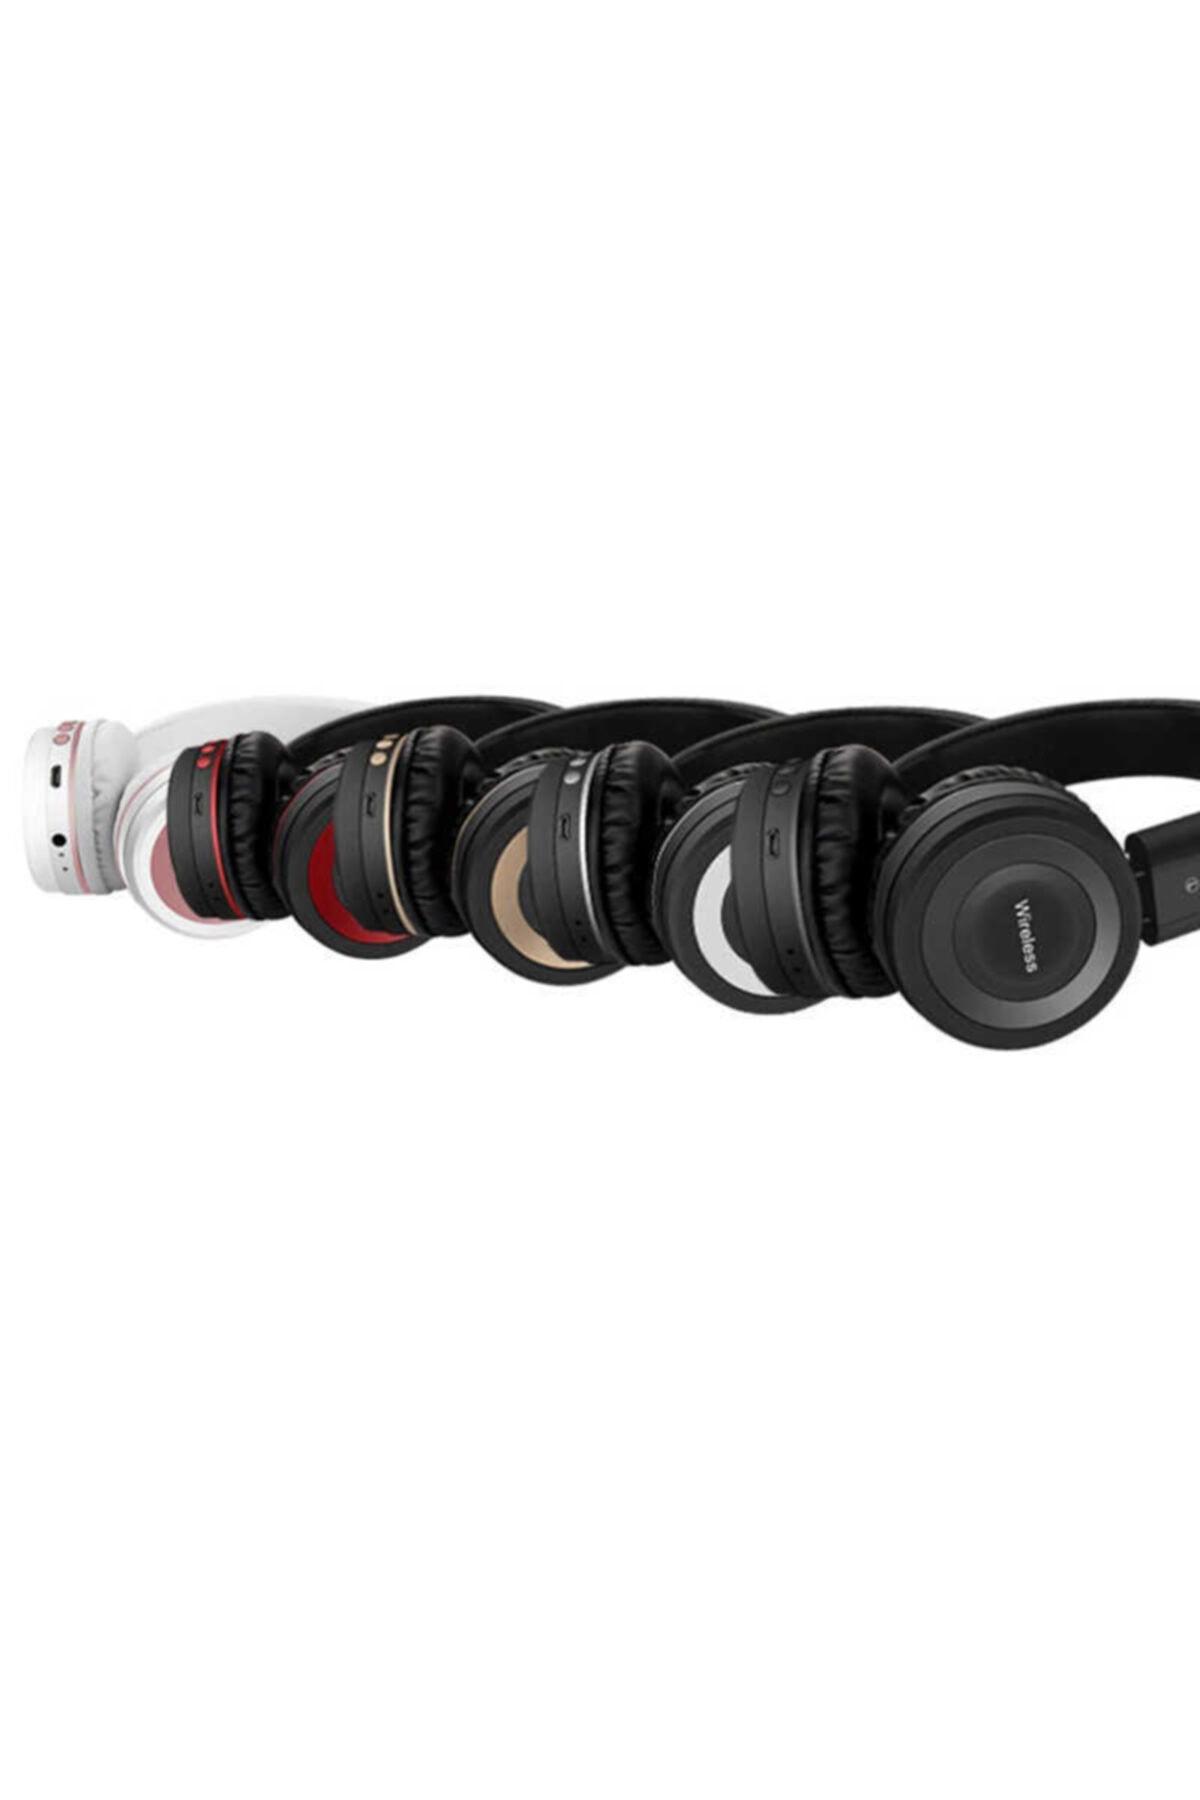 zore Bluetooth Kulaklık Kulaküstü Headset Kablosuz Kumandalı Mikrofonlu Kulaklık 2